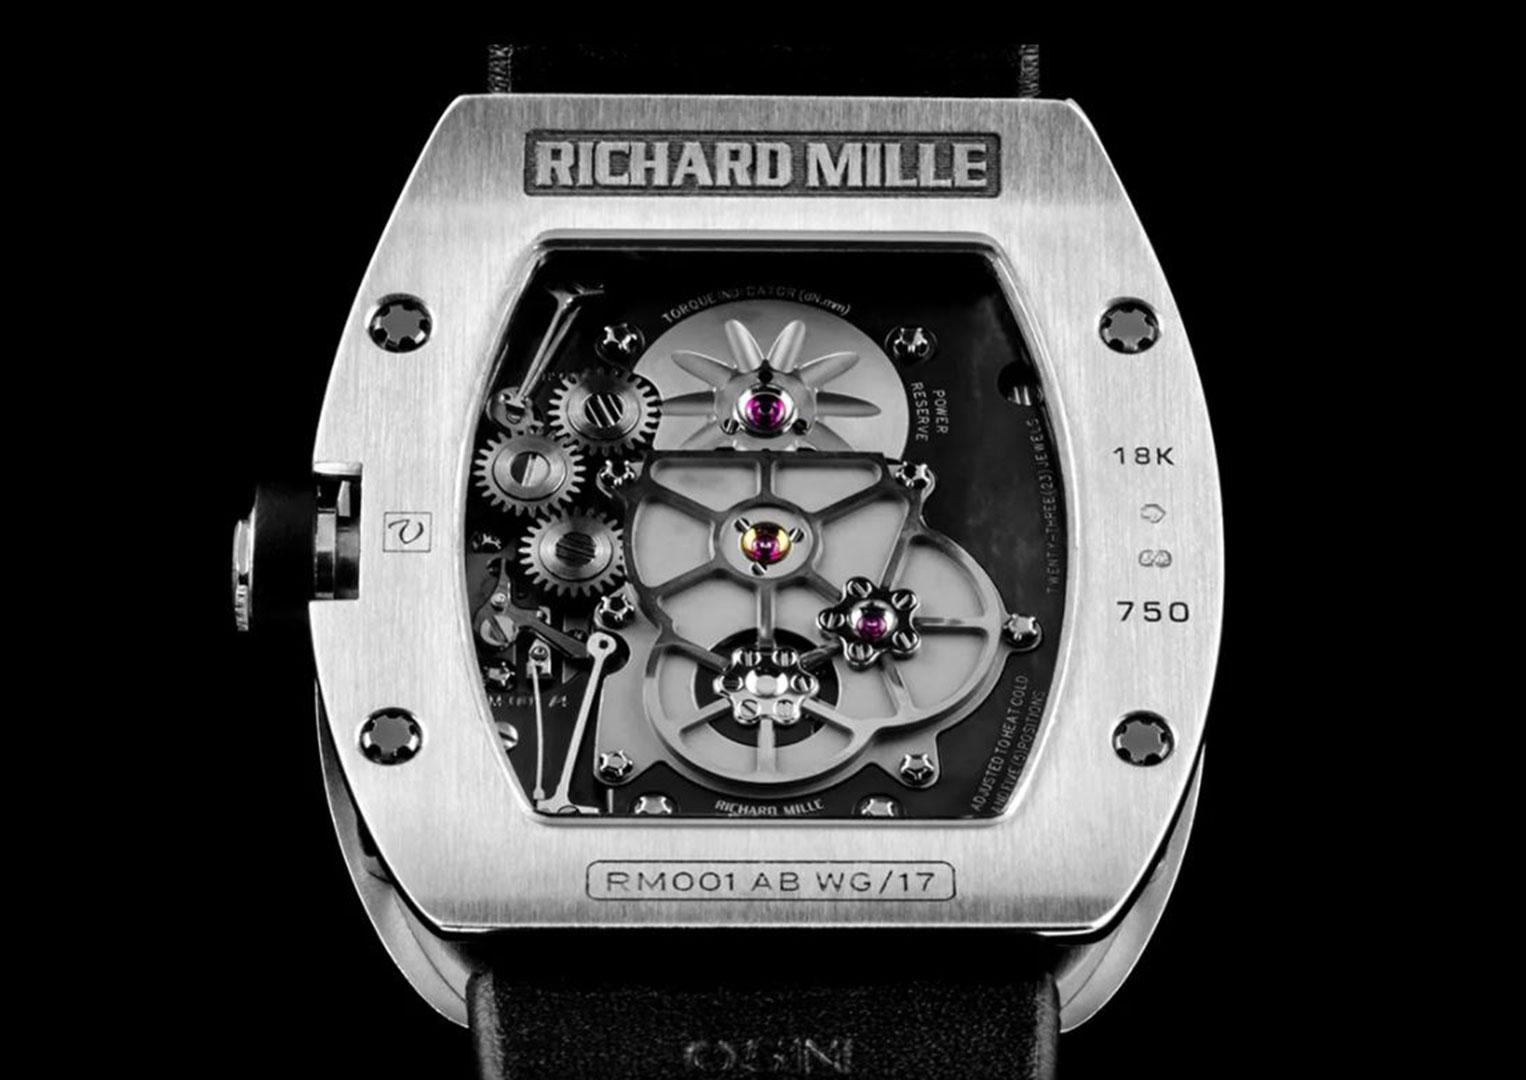 The reverse of Richard Mille's RM 001 model